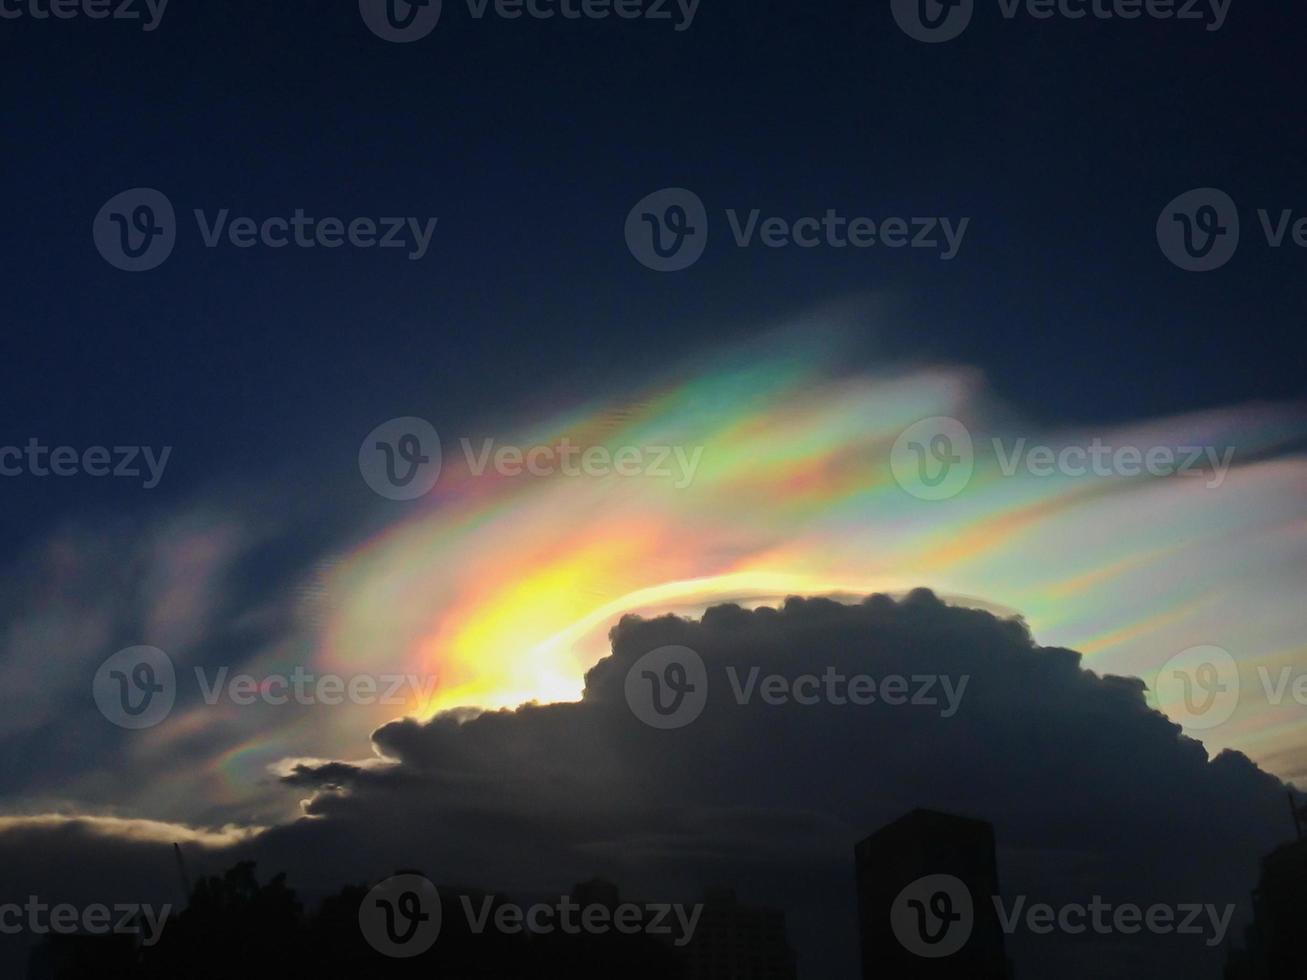 moln iridescence fenomen foto